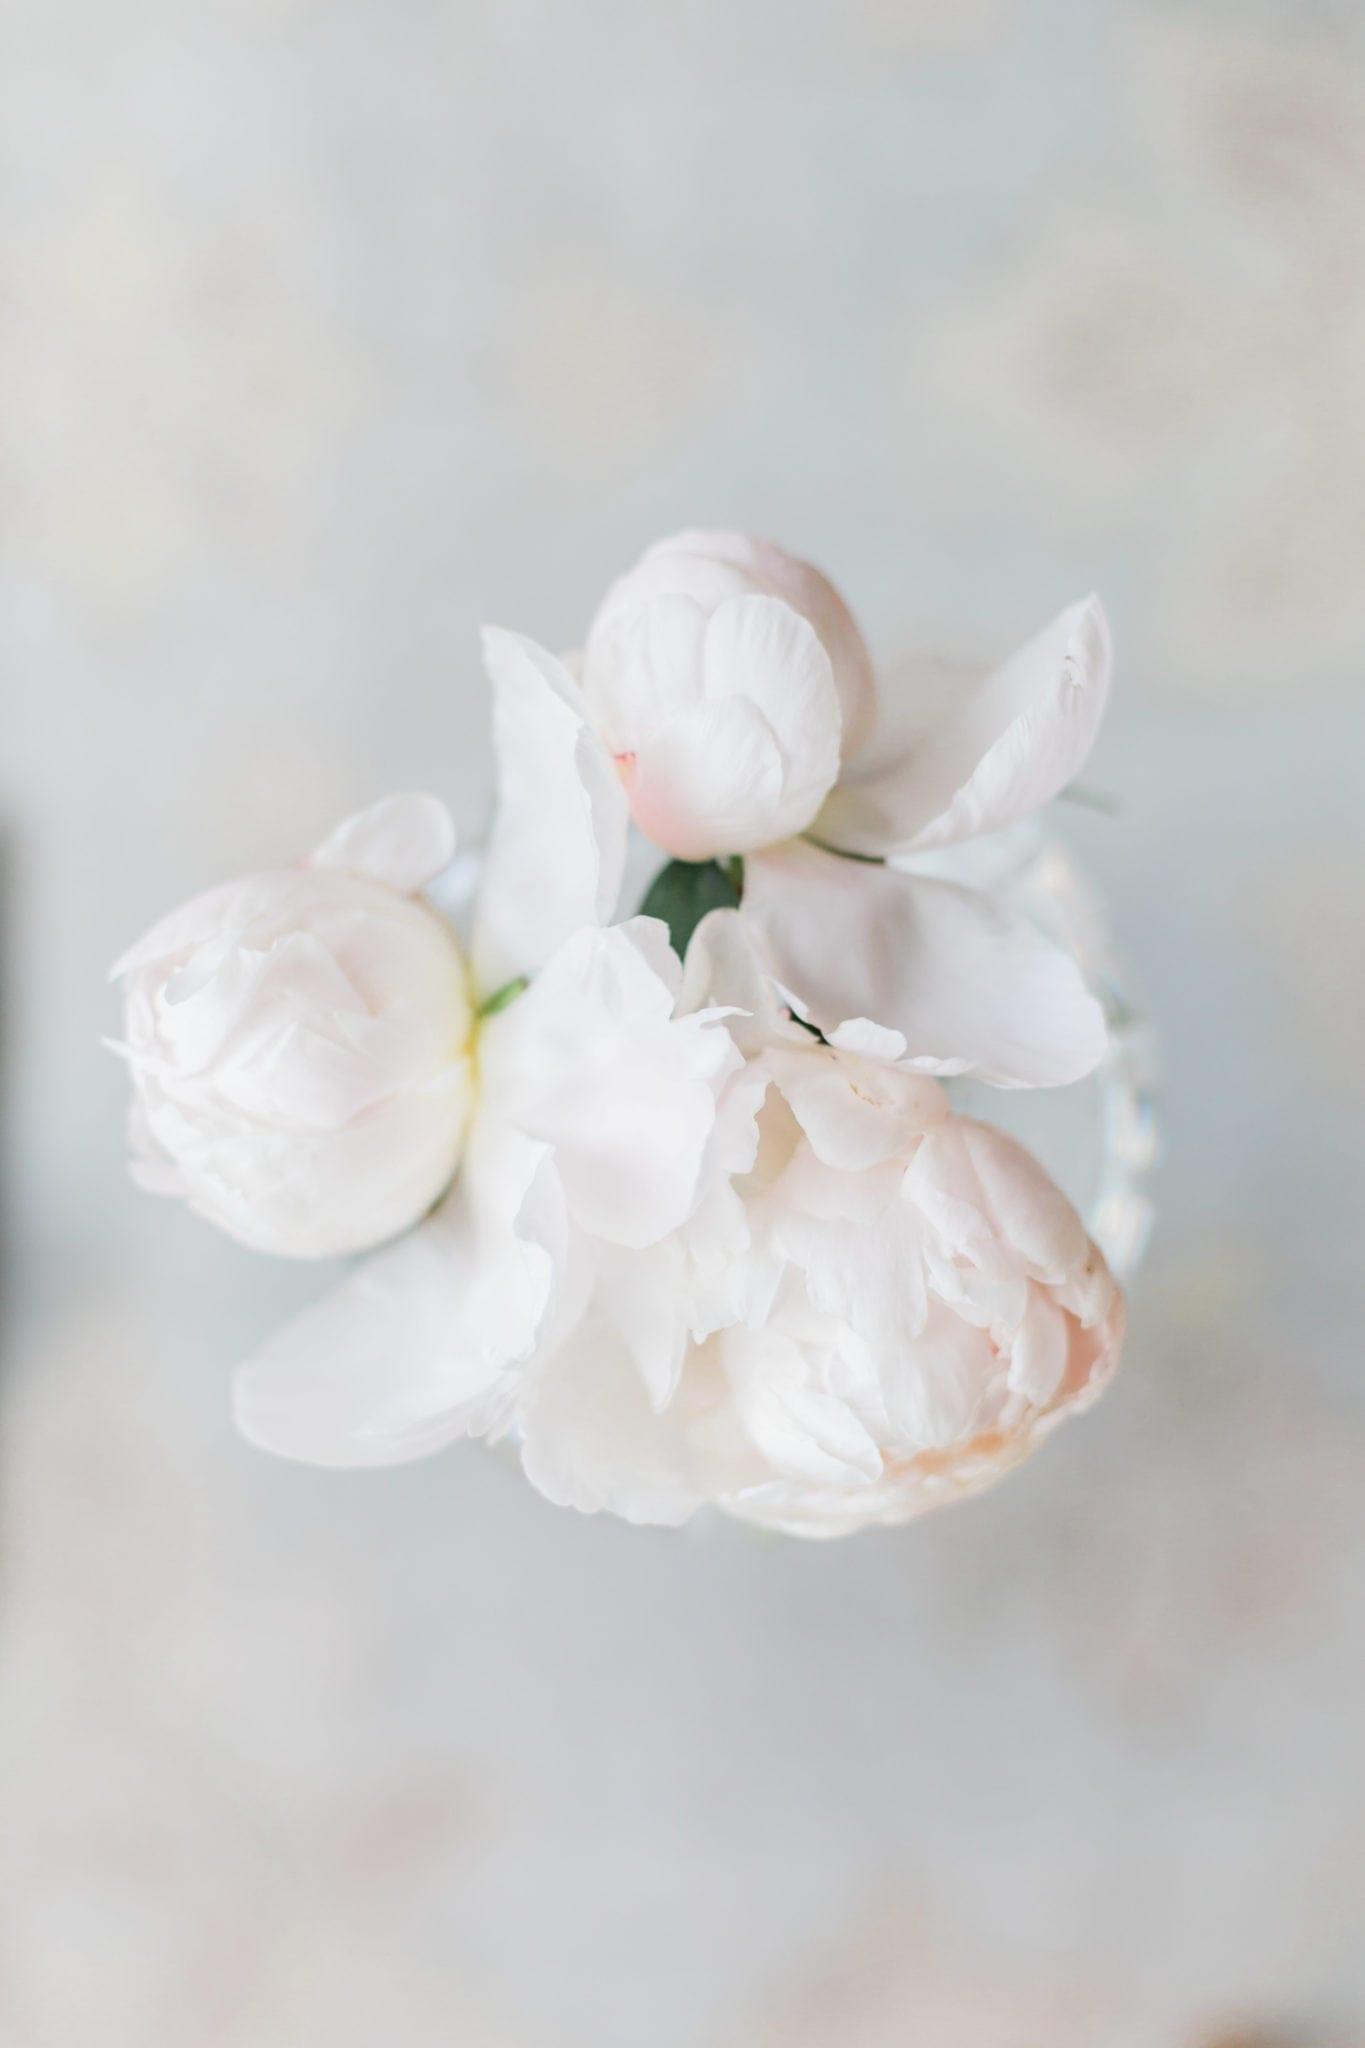 Soft pink peony petals.